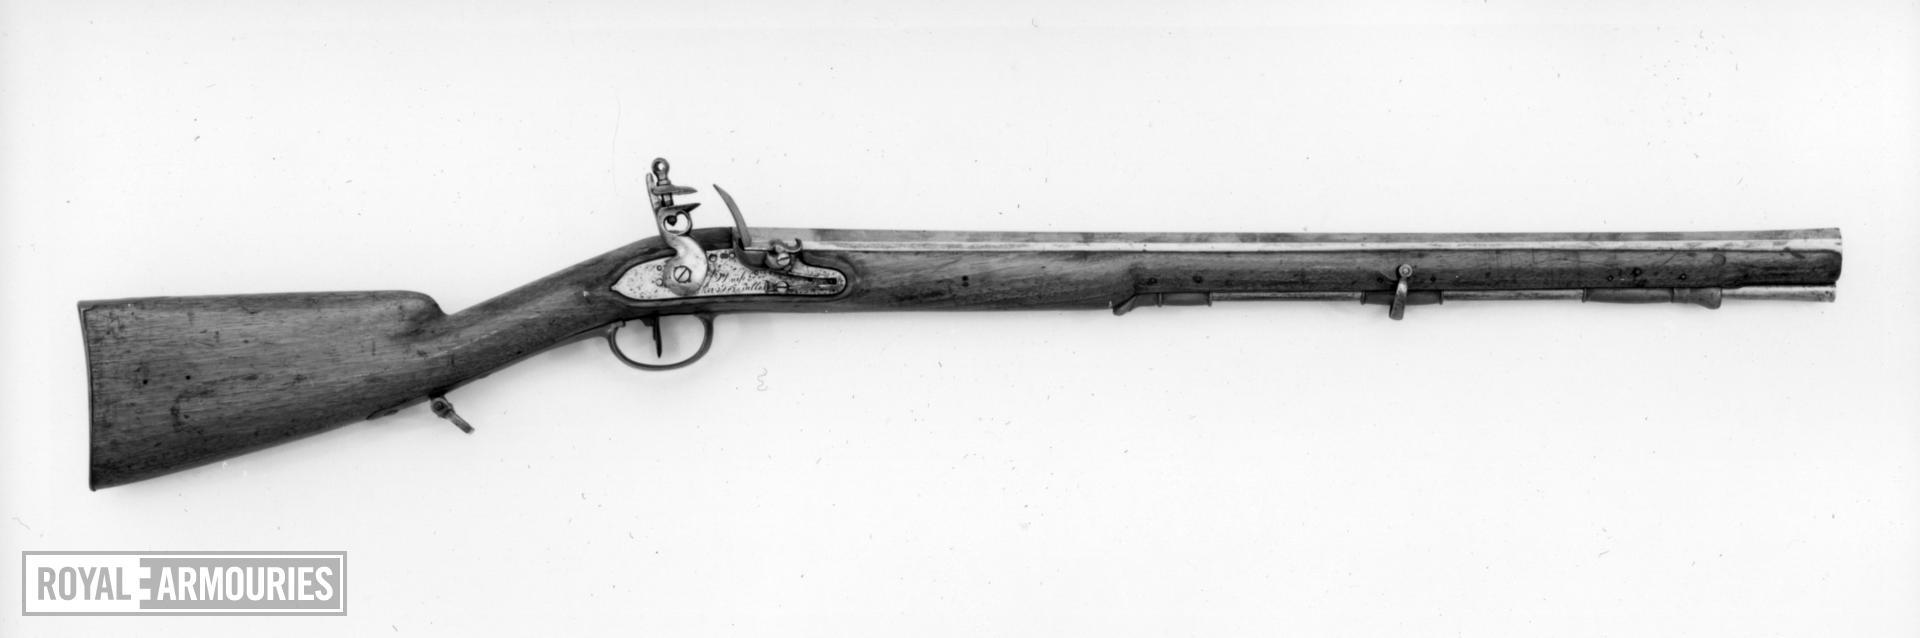 Flintlock muzzle-loading rifle - Model 1793